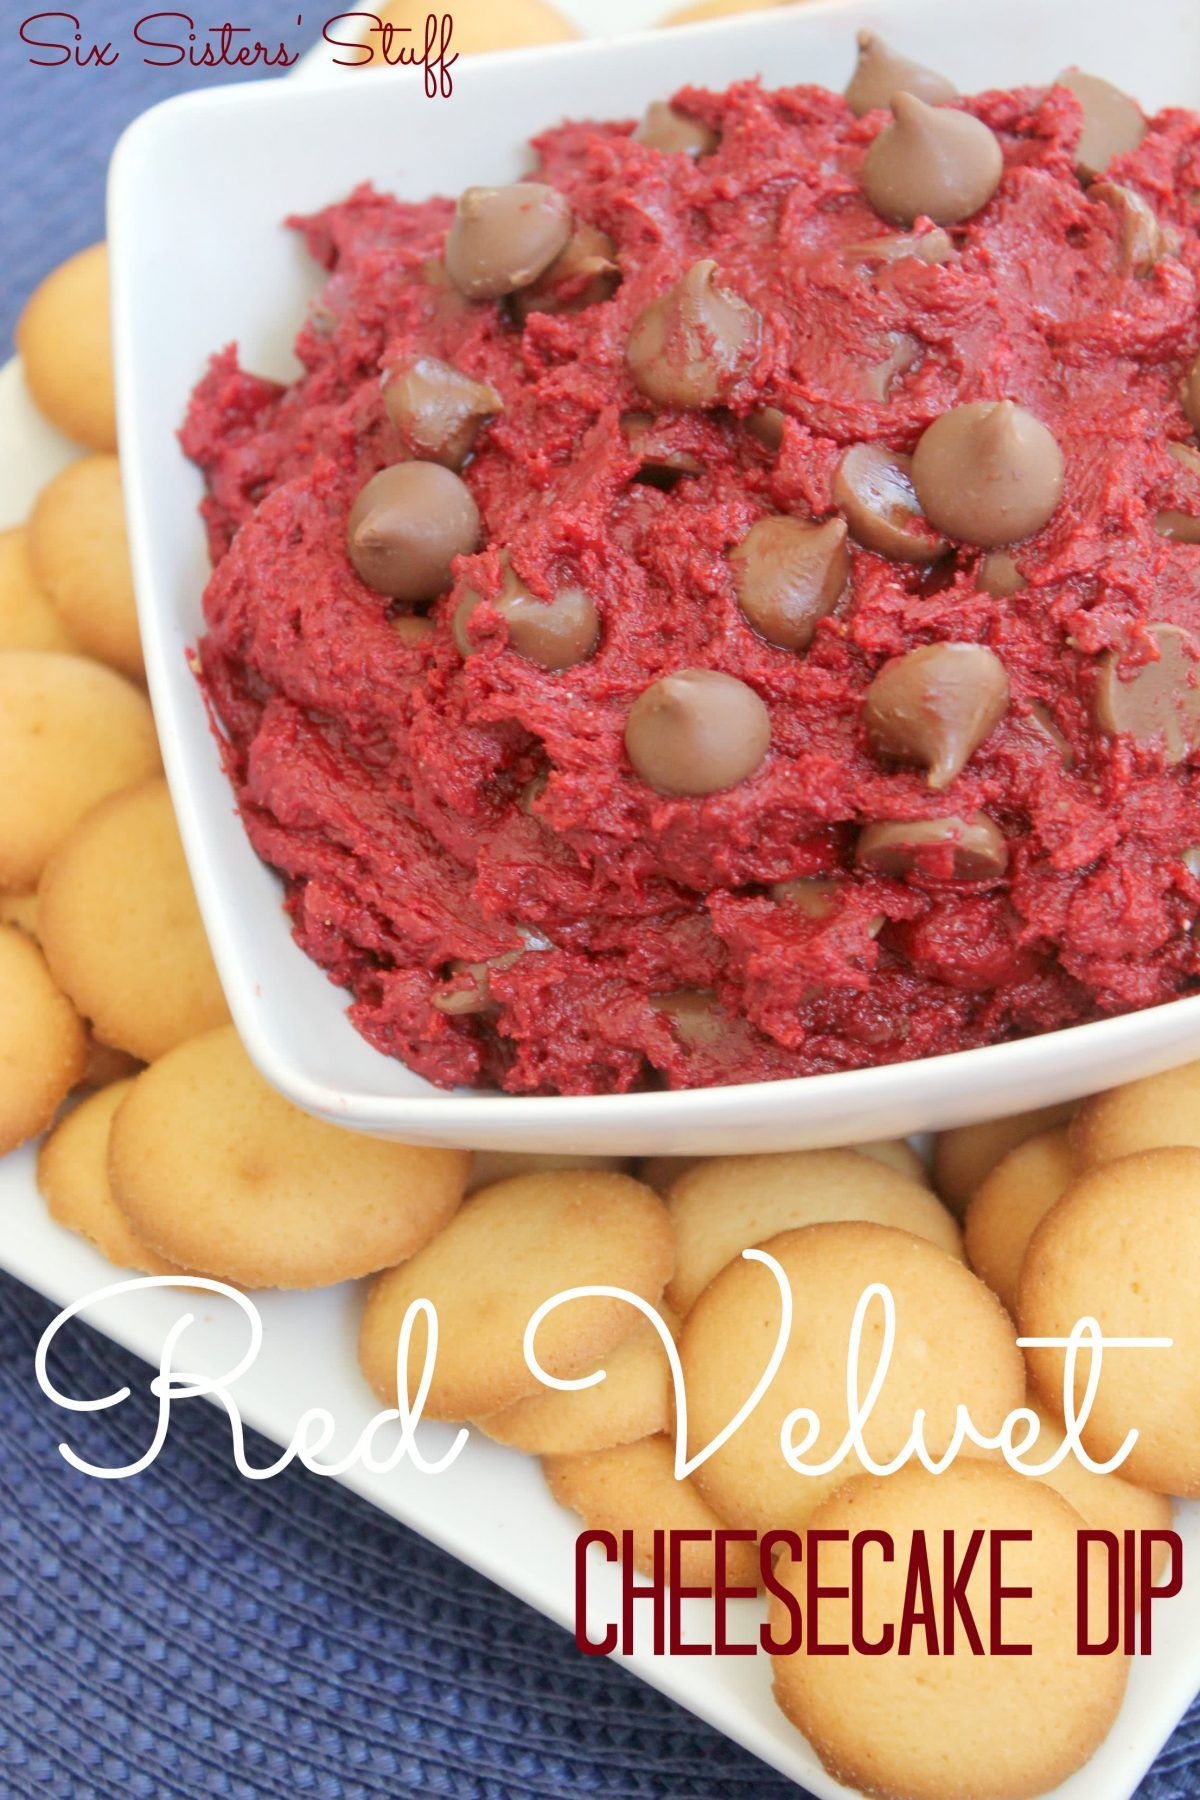 Red Velvet Cheesecake Dip Recipe Recipe Cheesecake Dip Recipe Yummy Dips Sweet Dips